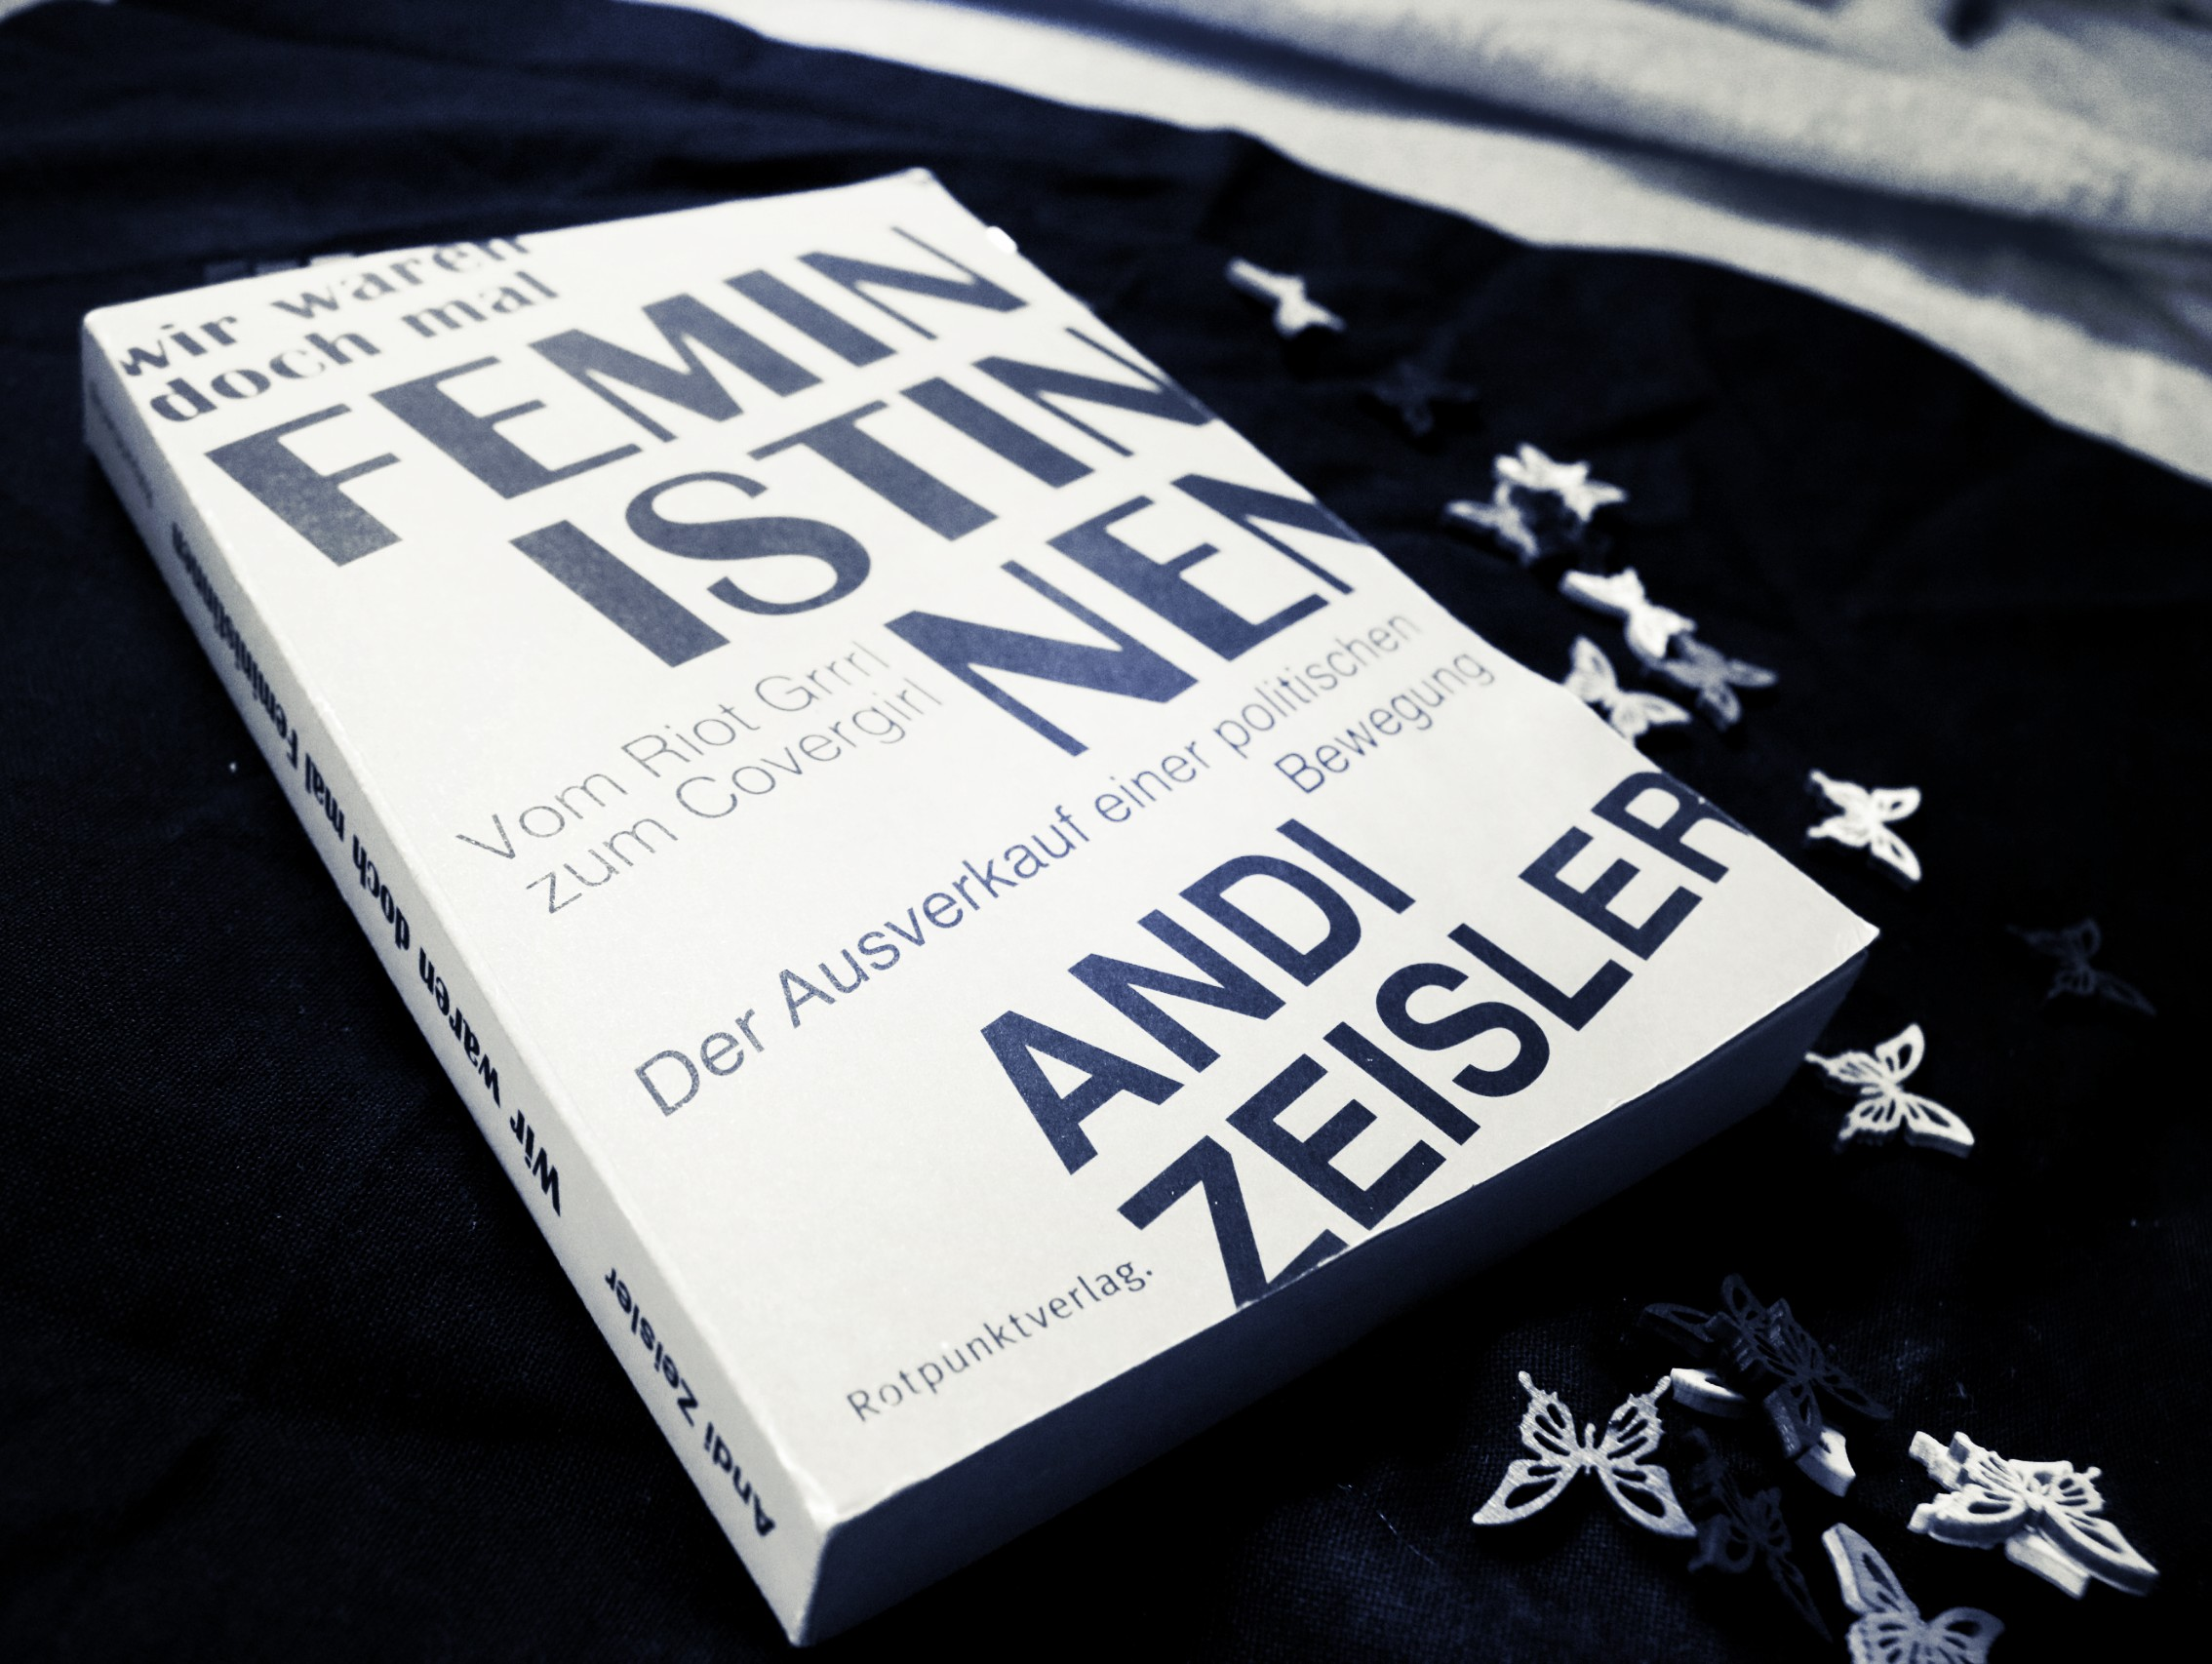 [Rezension] Andi Zeisler – Wir waren doch mal Feministinnen